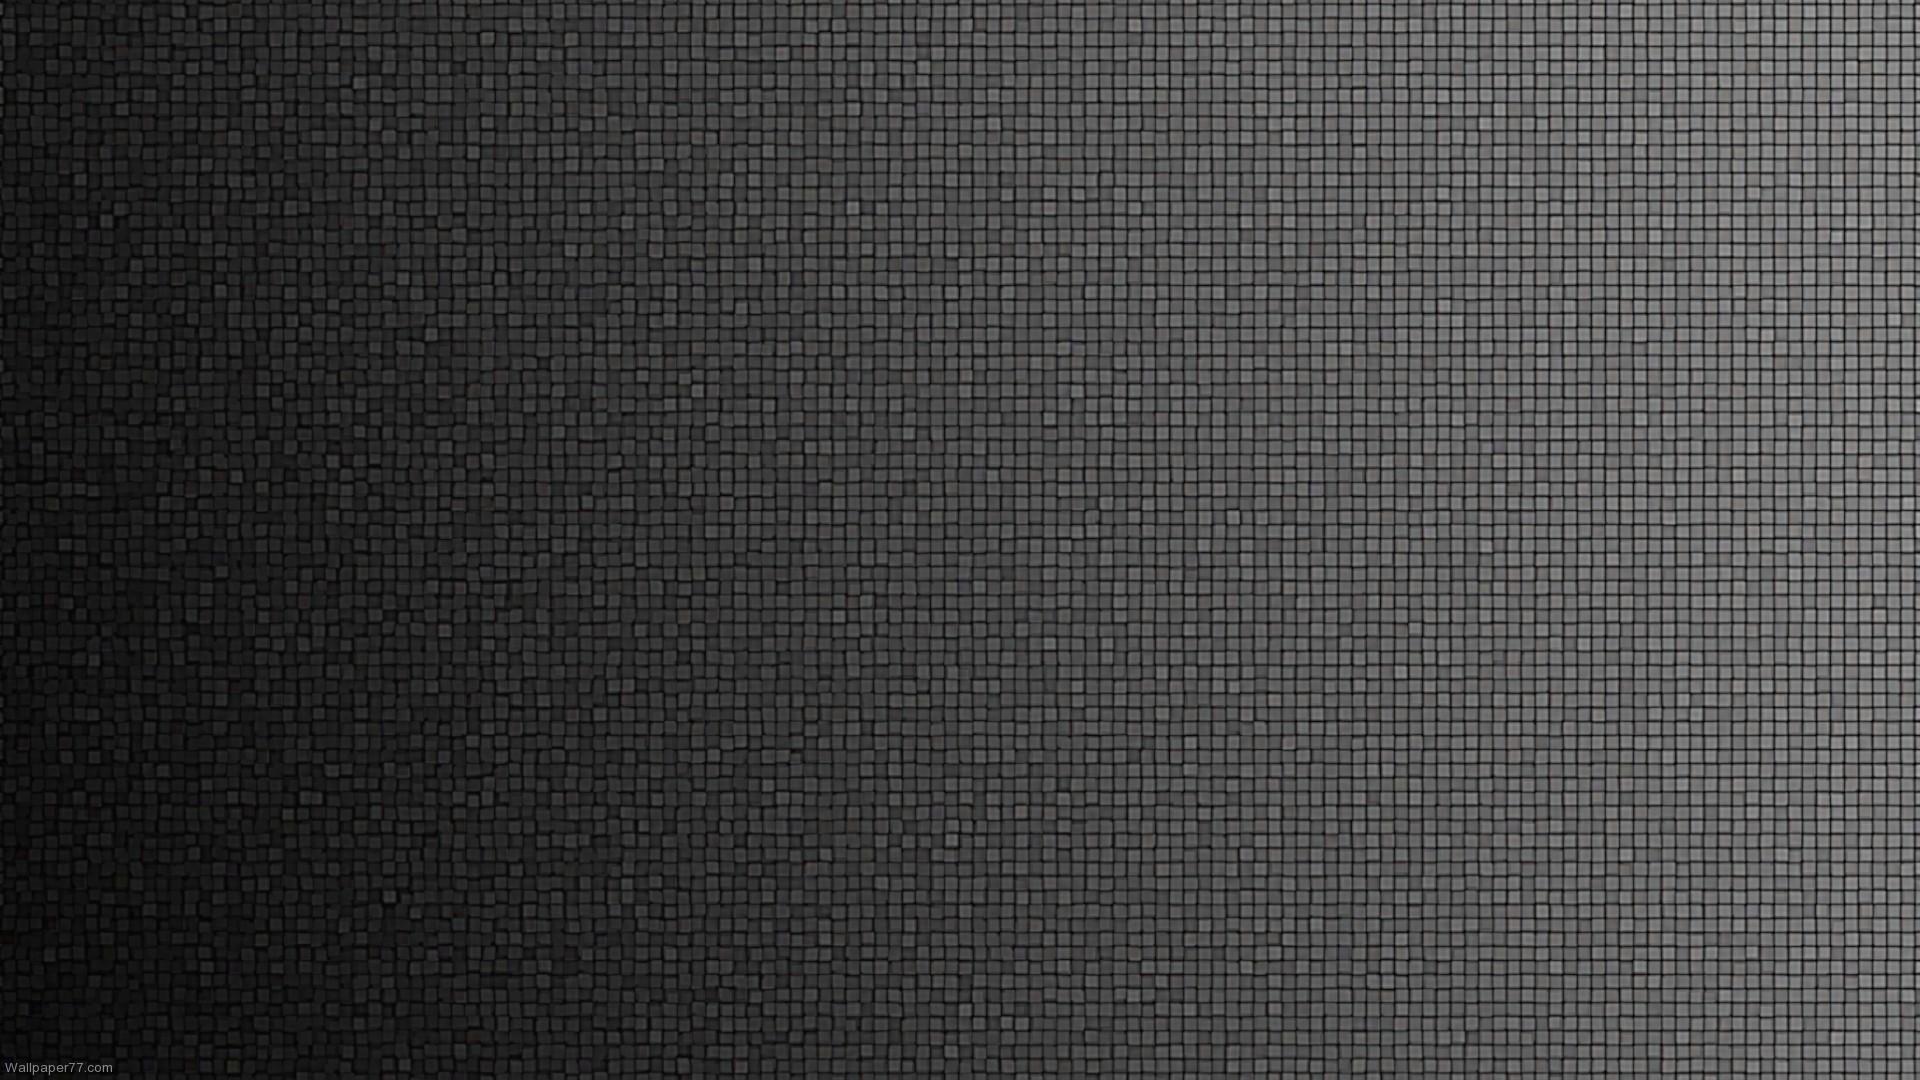 Retina Display Wallpaper